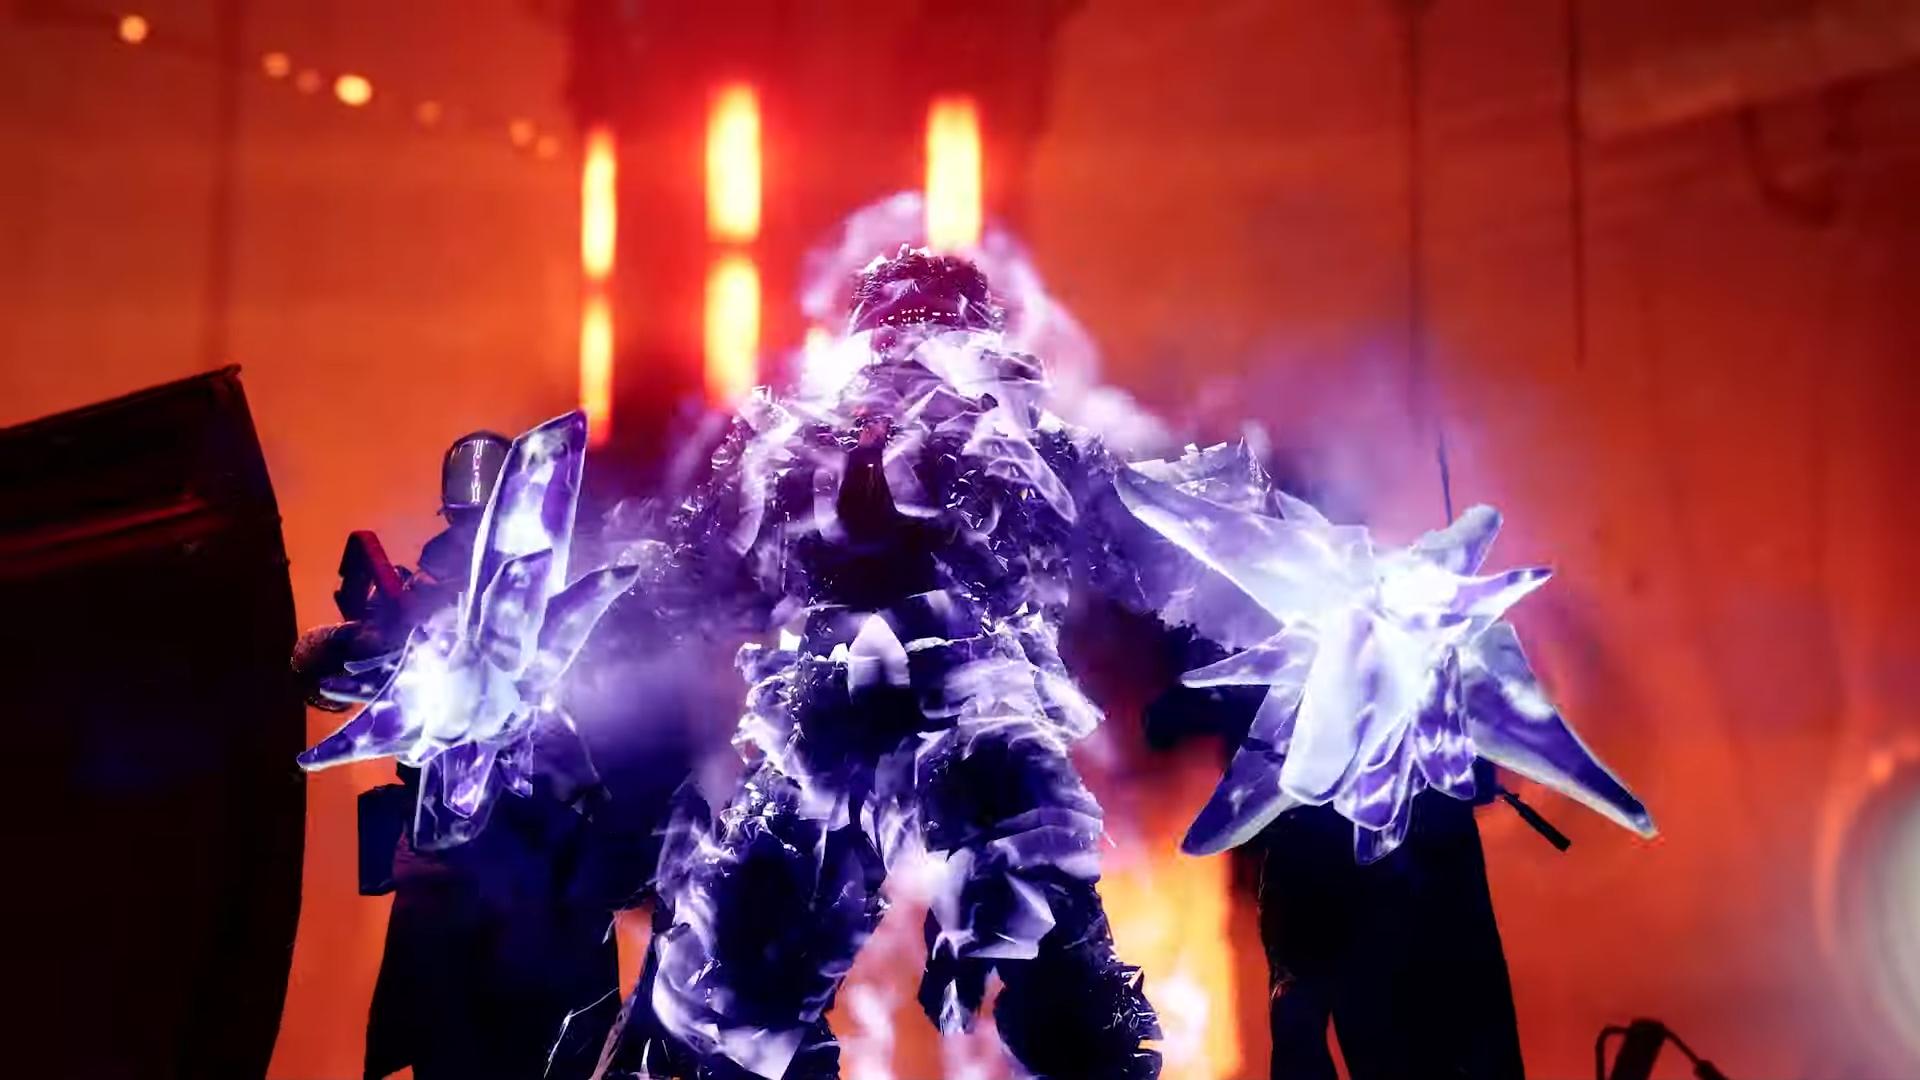 Destiny 2 Titan activating their Stasis Super